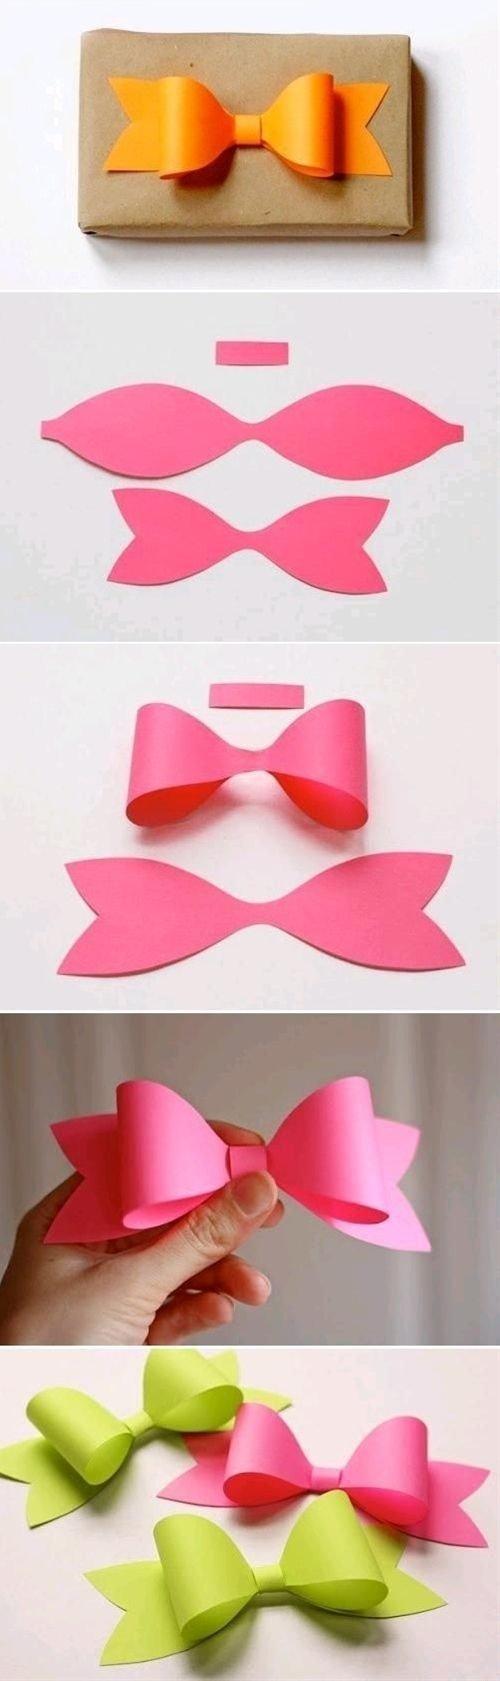 color,pink,petal,paper,design,